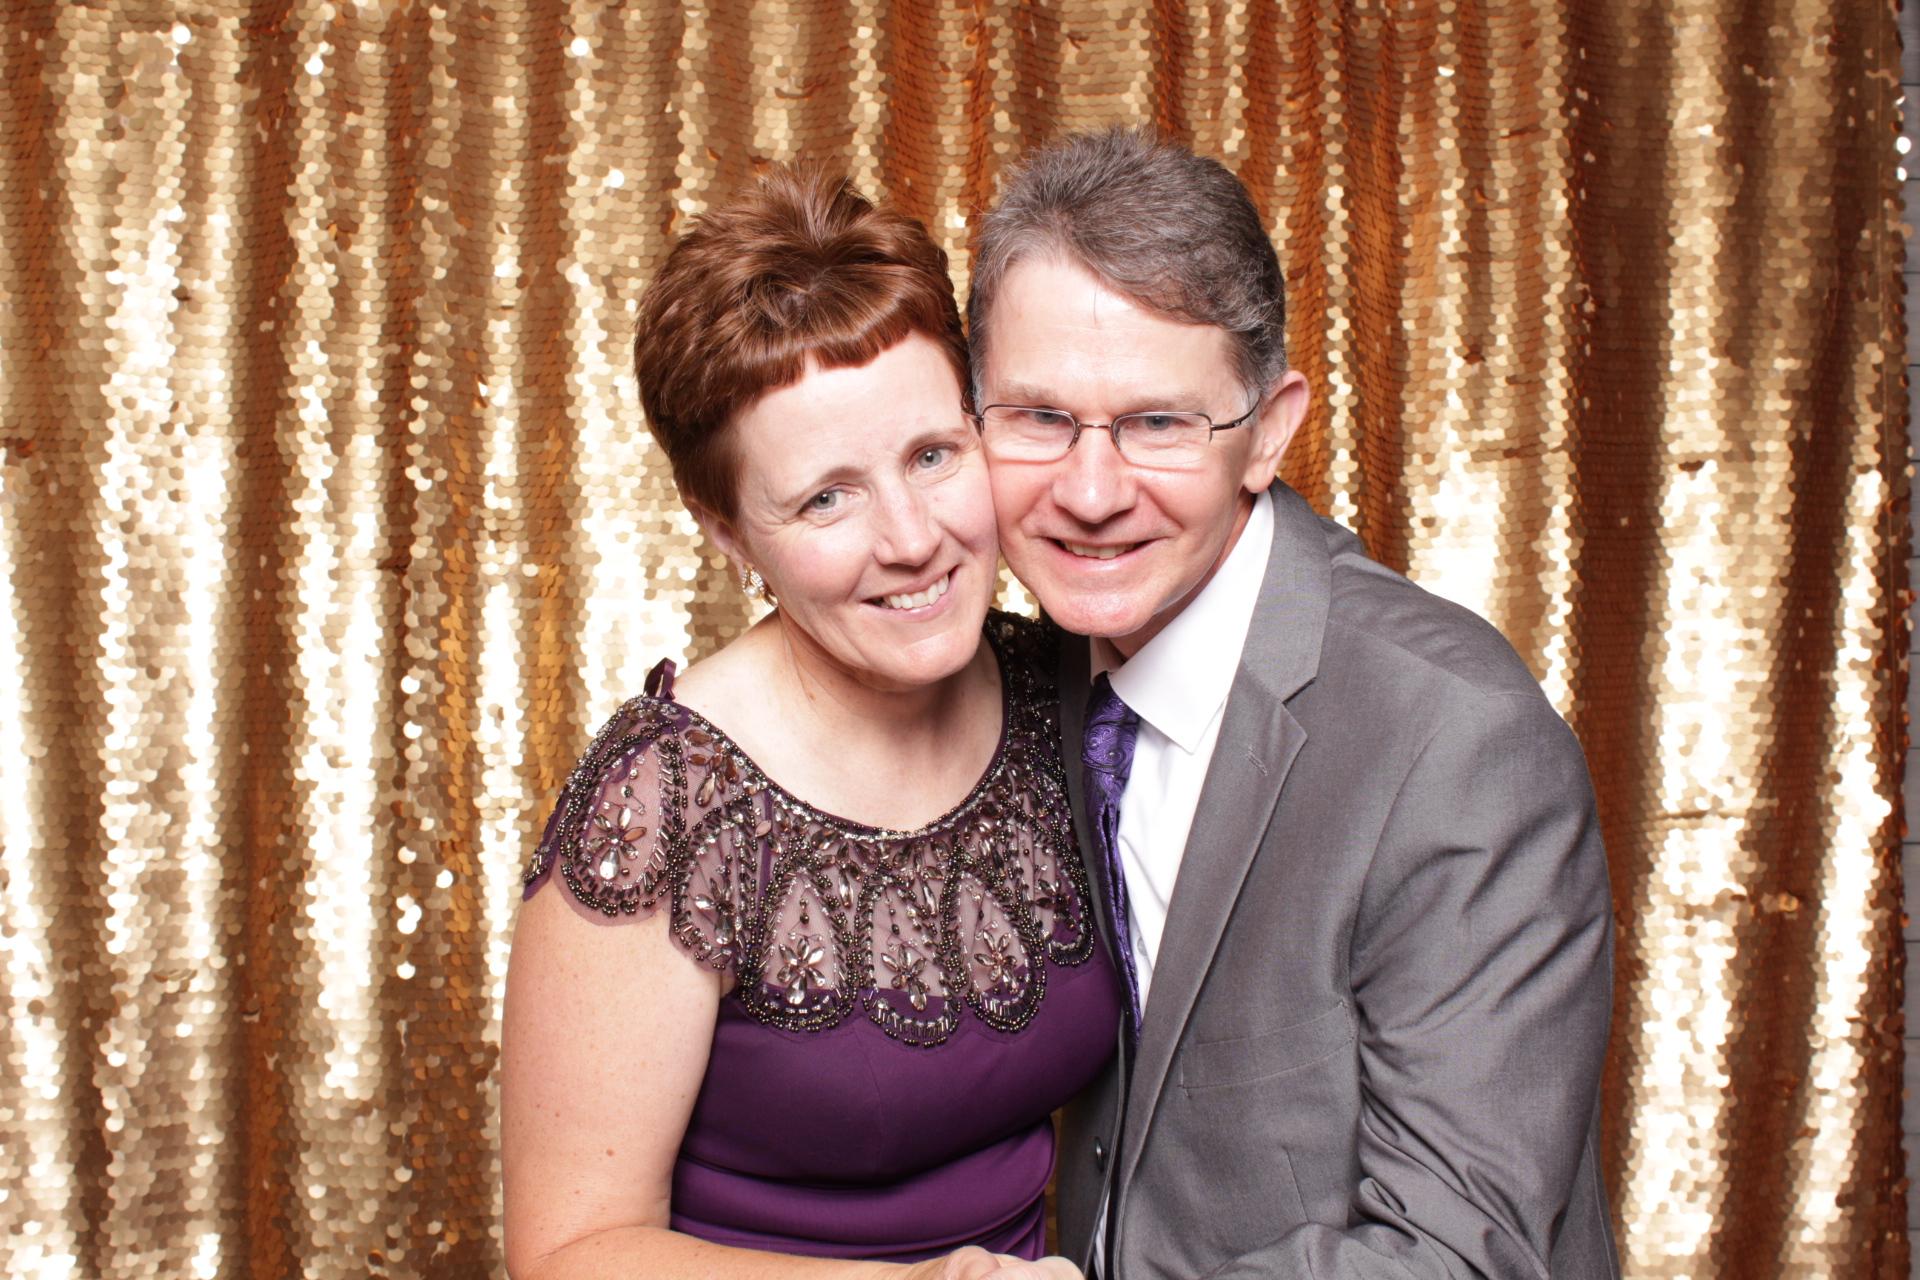 Minneapolis_wedding_photo_booth_Machine_Shop (24).jpg